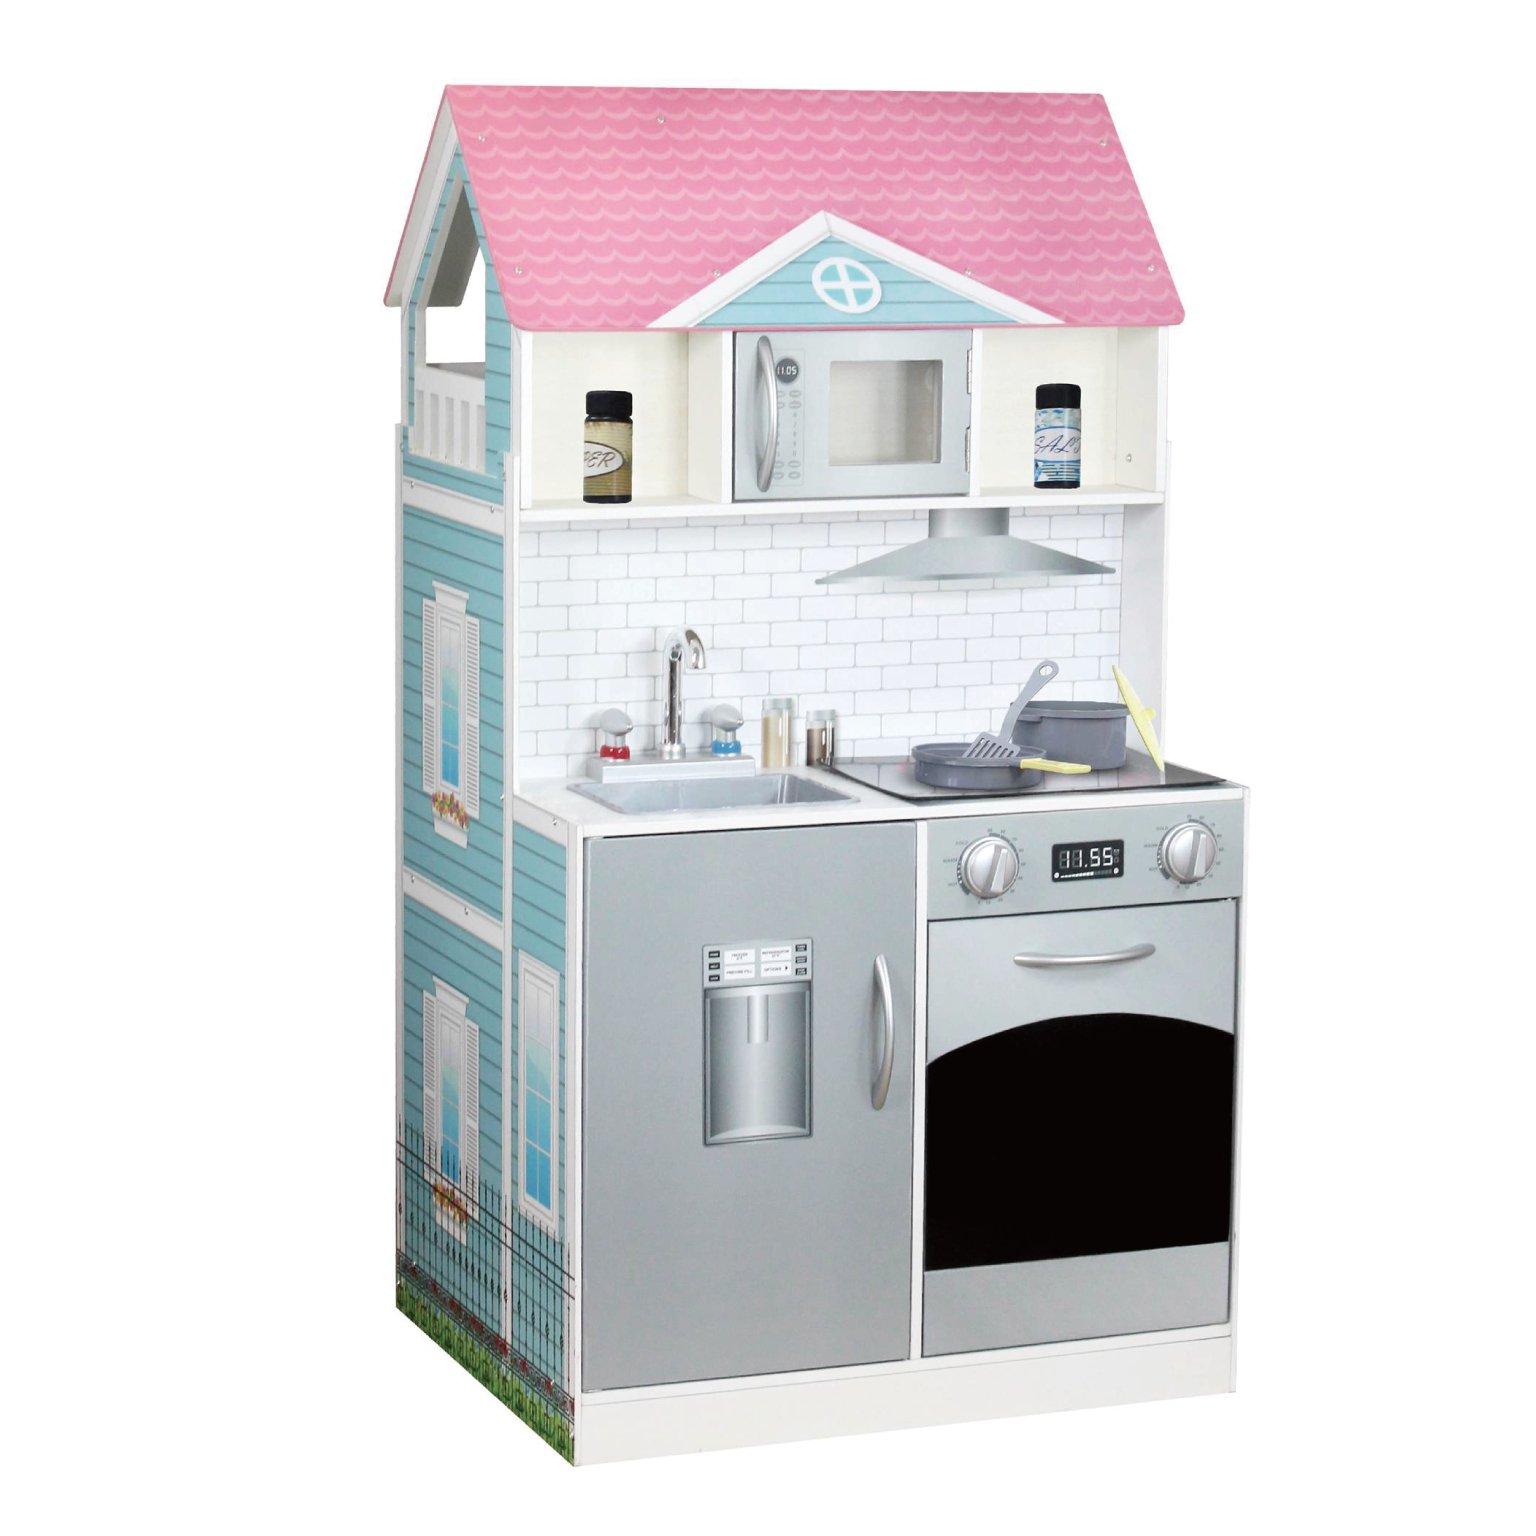 Teamson Kids Wonderland Ariel 2 in 1 Doll House & Play Kitchen - Muti-color